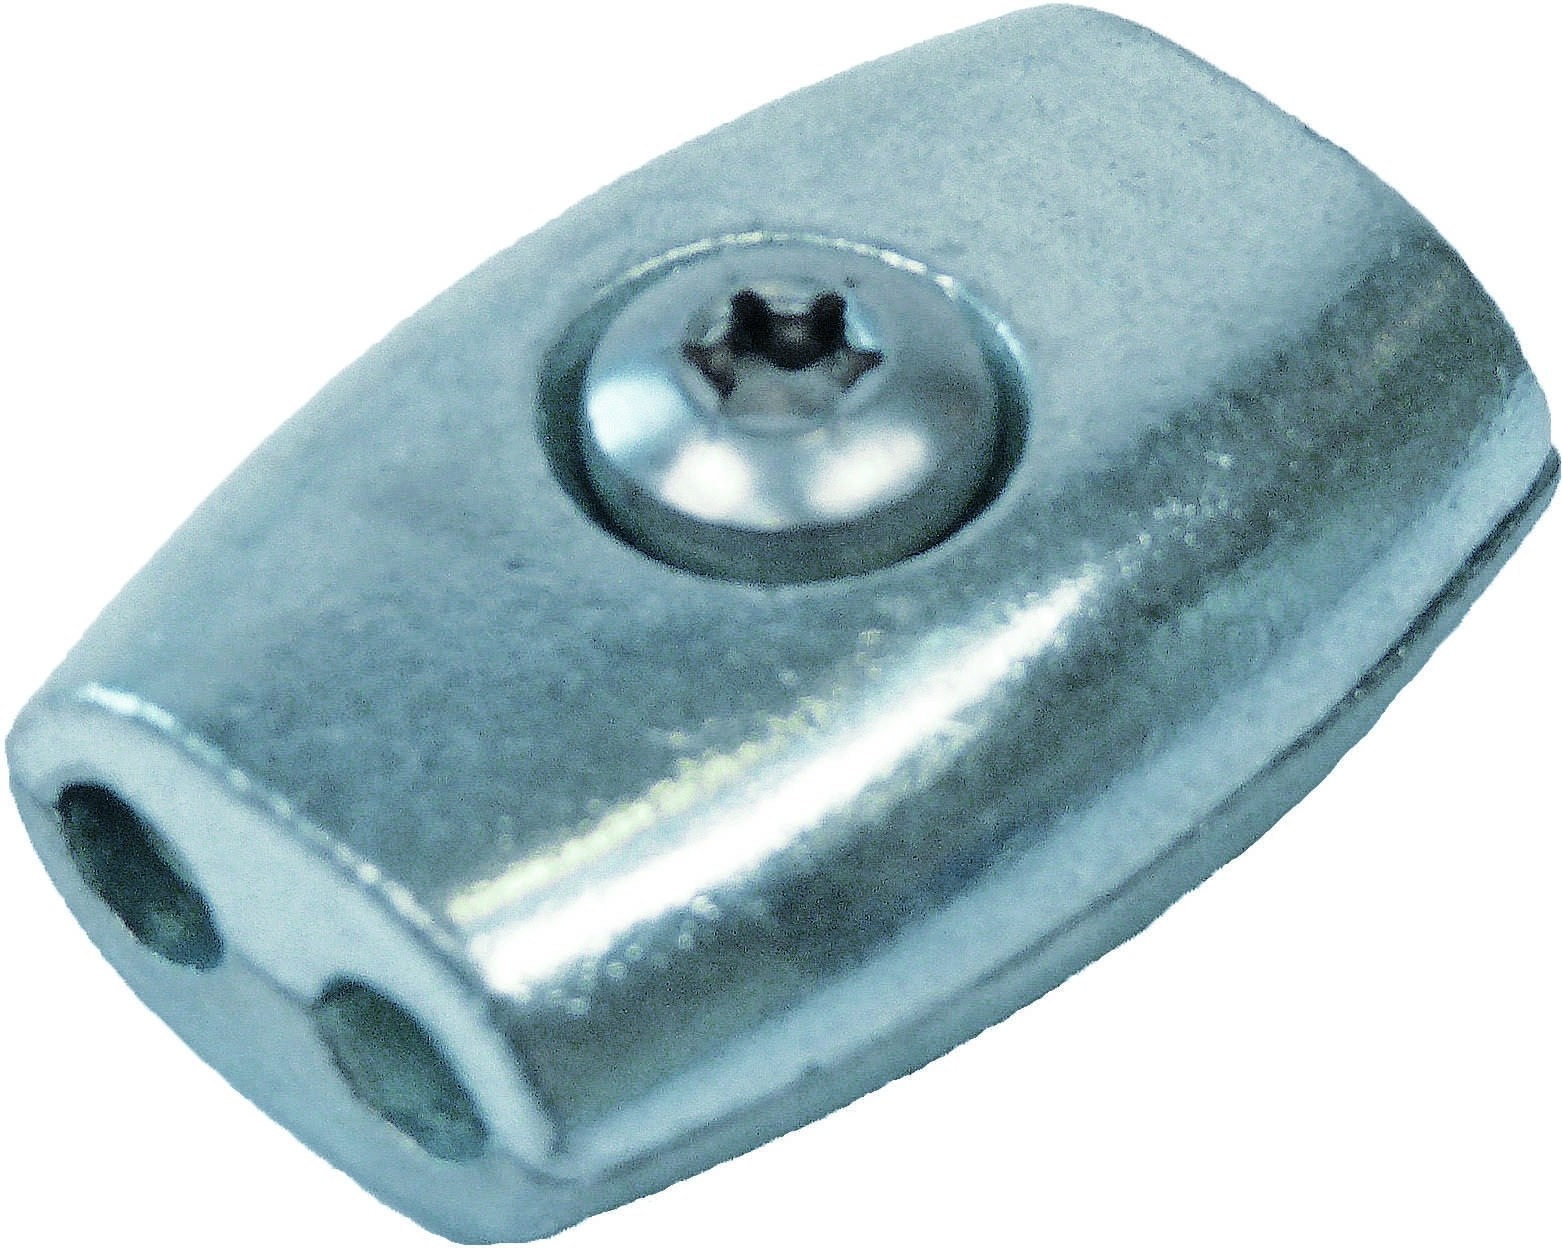 Staaldraadklem eivormig 6mm RVS A4 1 stuks